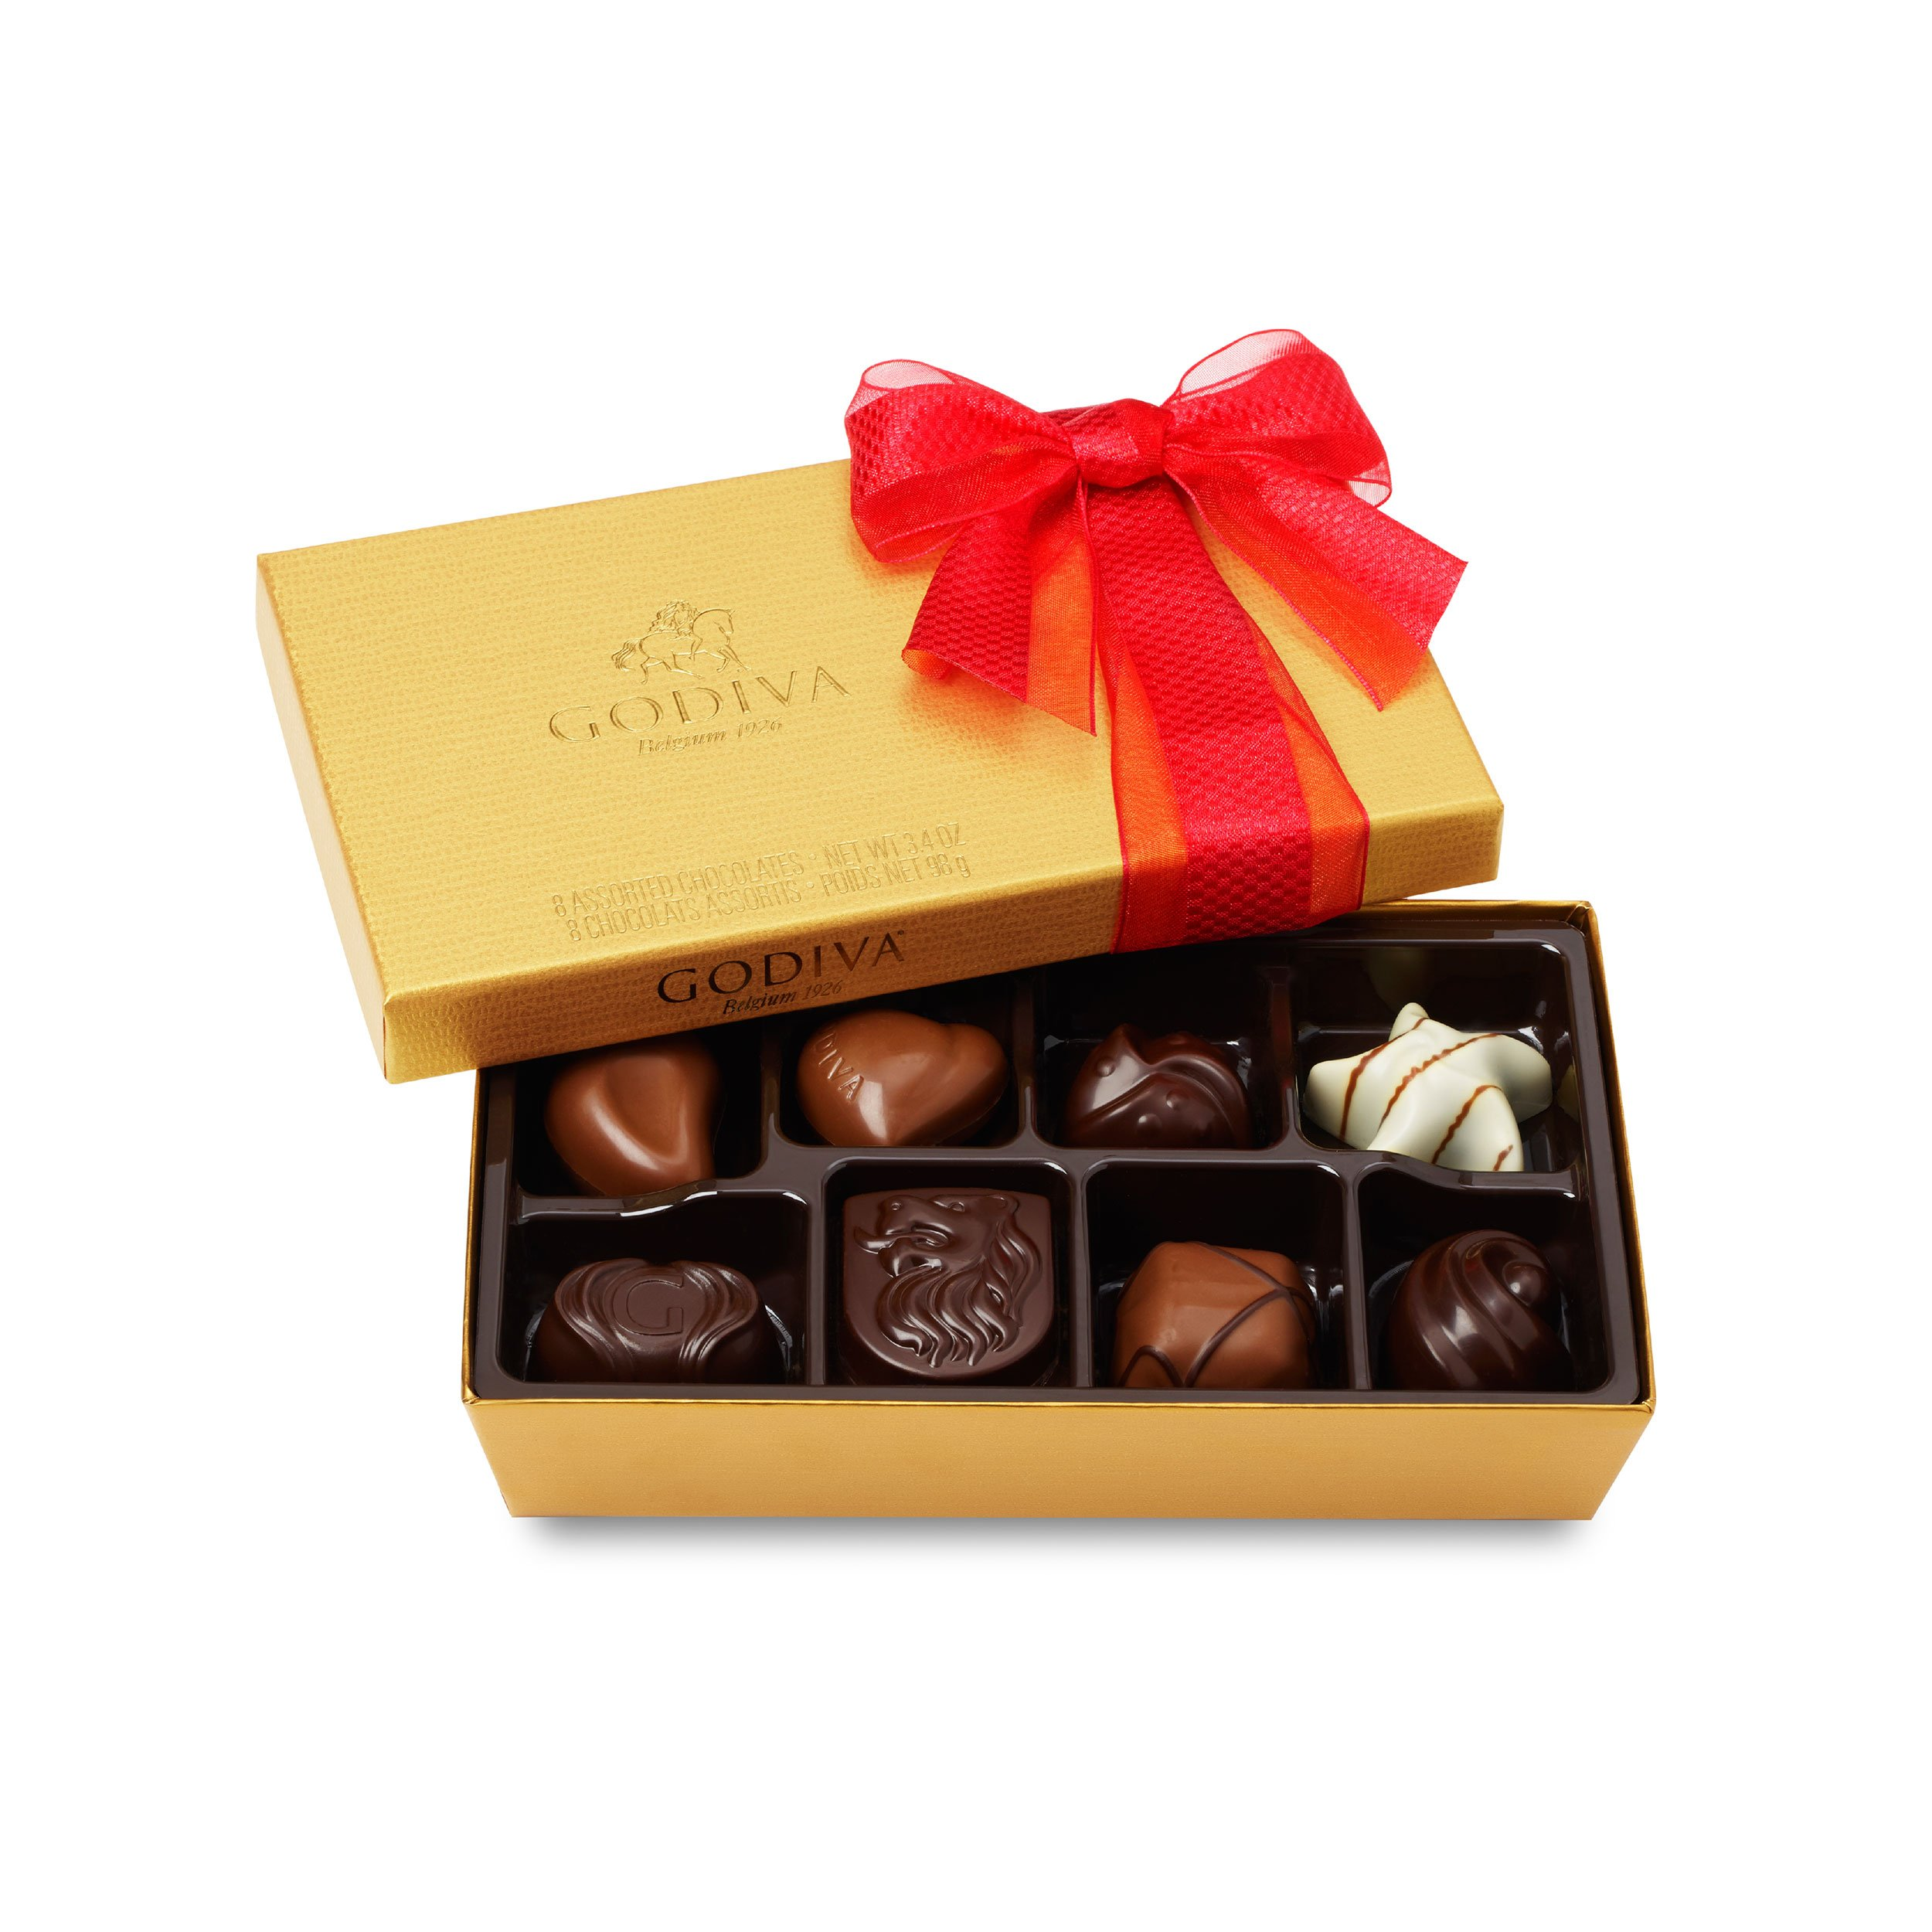 Godiva Chocolatier Mother's Day Gold Ballotin Assorted Gourmet Chocolates 8 Piece Gift Box